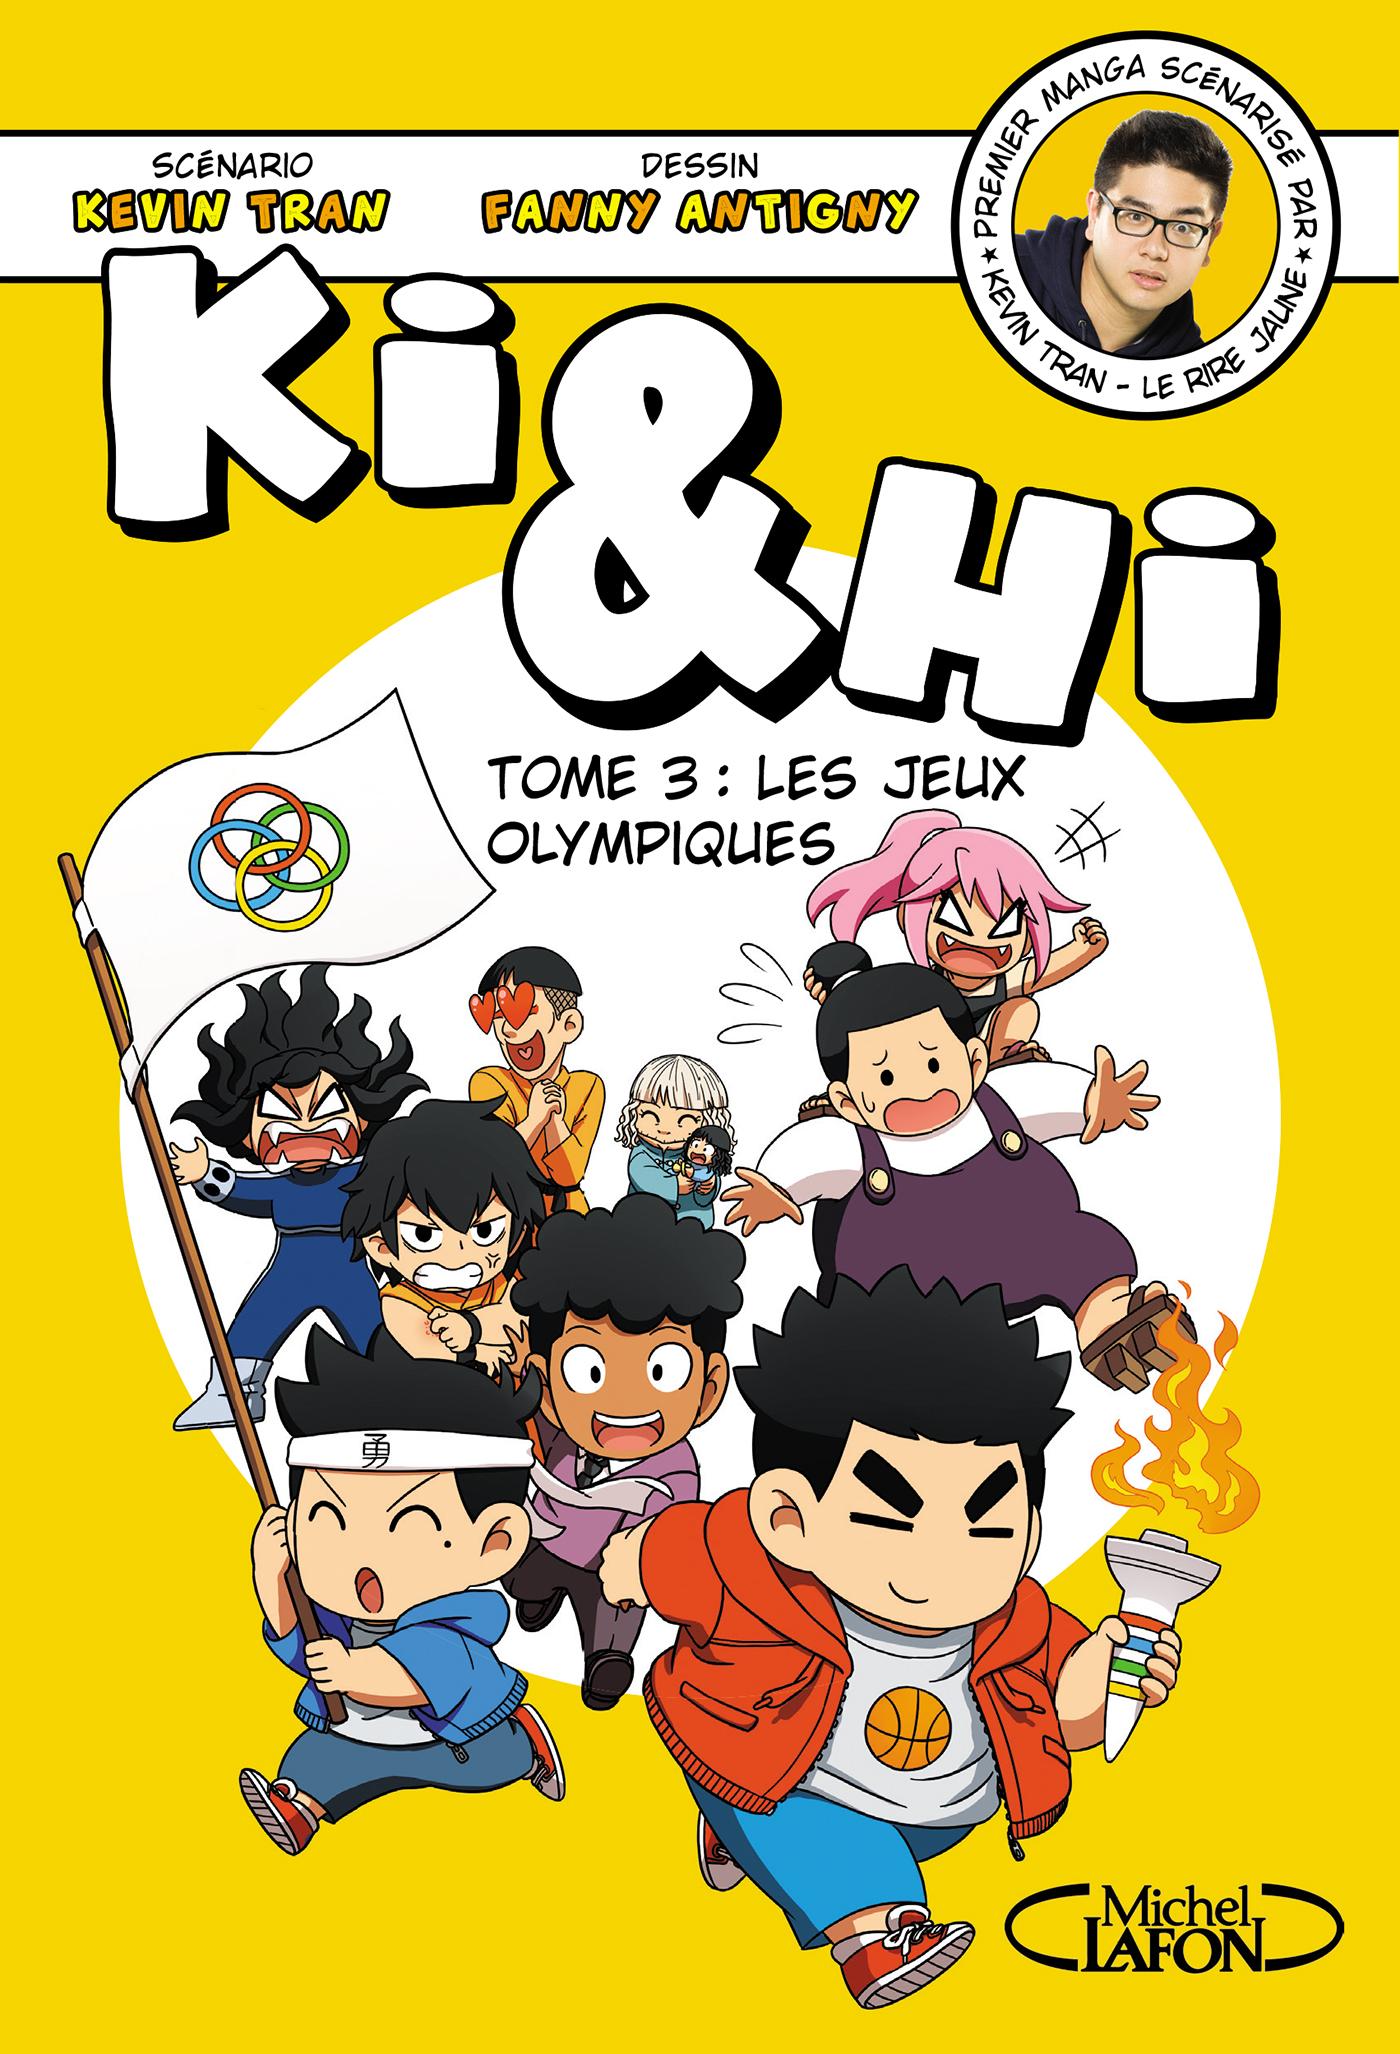 Ki Et Hi Tome 5 : Olympiques, Michel, Lafon